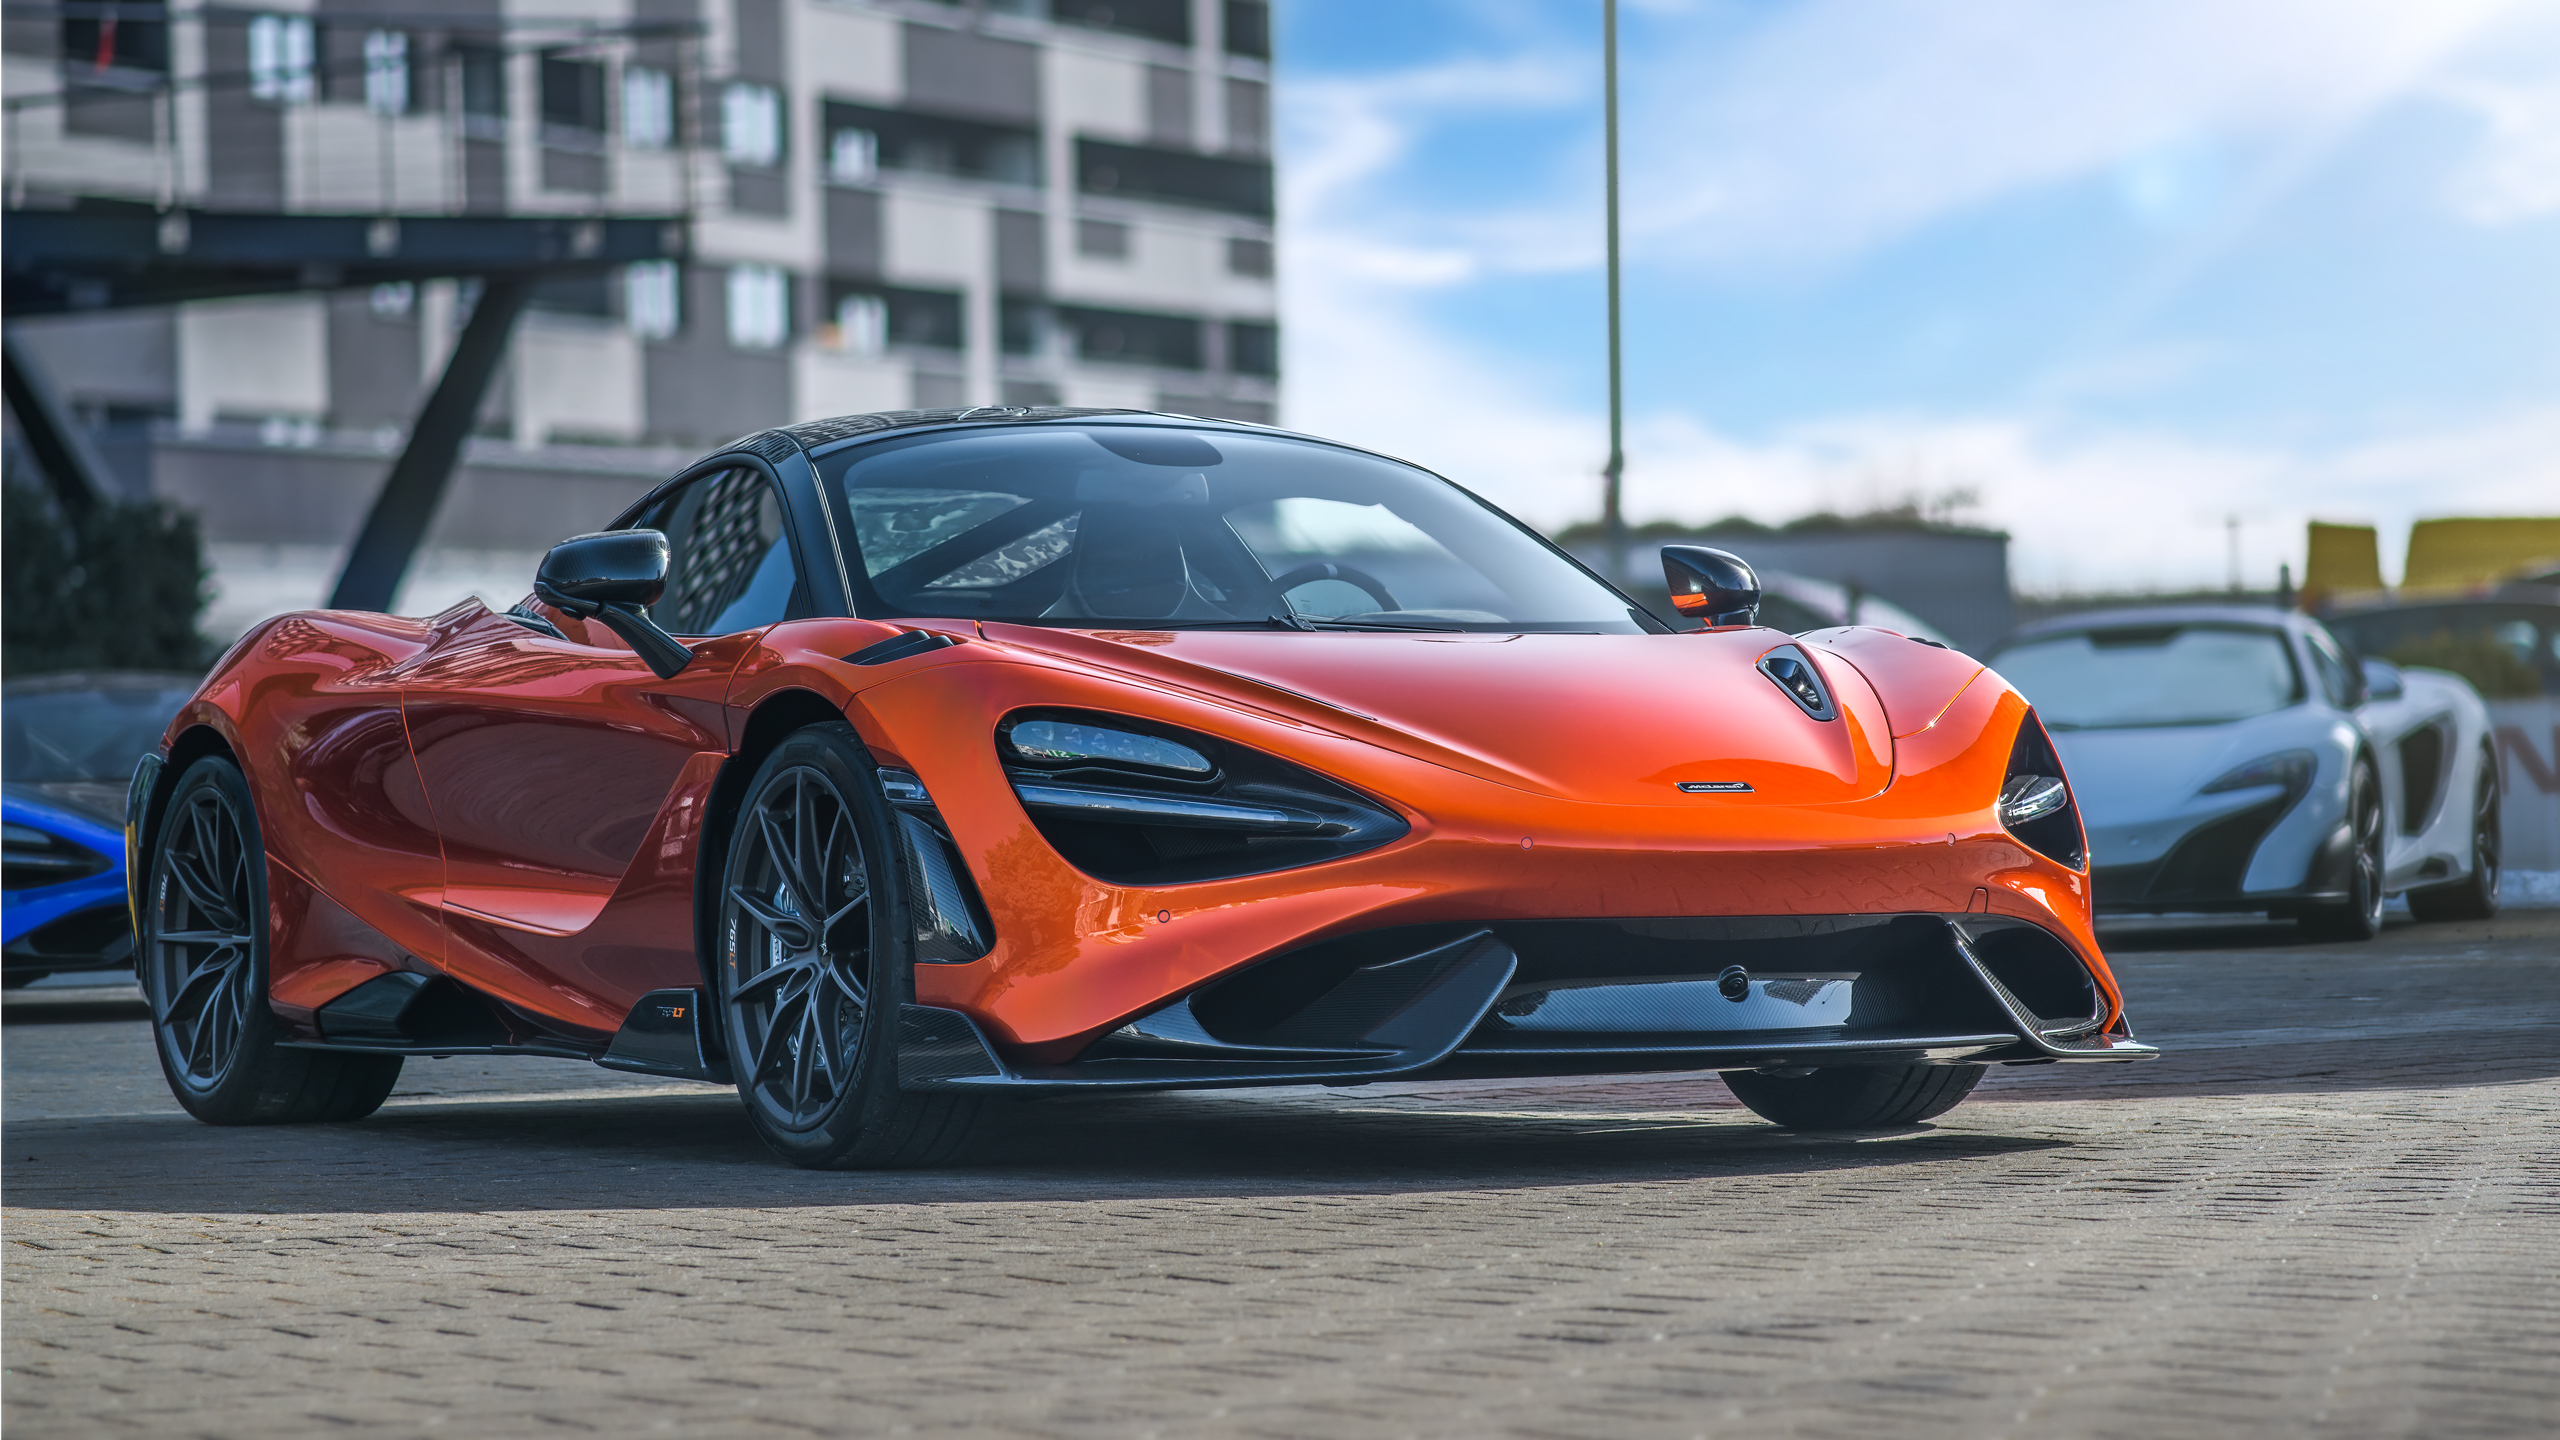 McLaren 765LT McLaren Supercars Sports Car Car Vehicle Orange Cars Depth Of Field 2560x1440